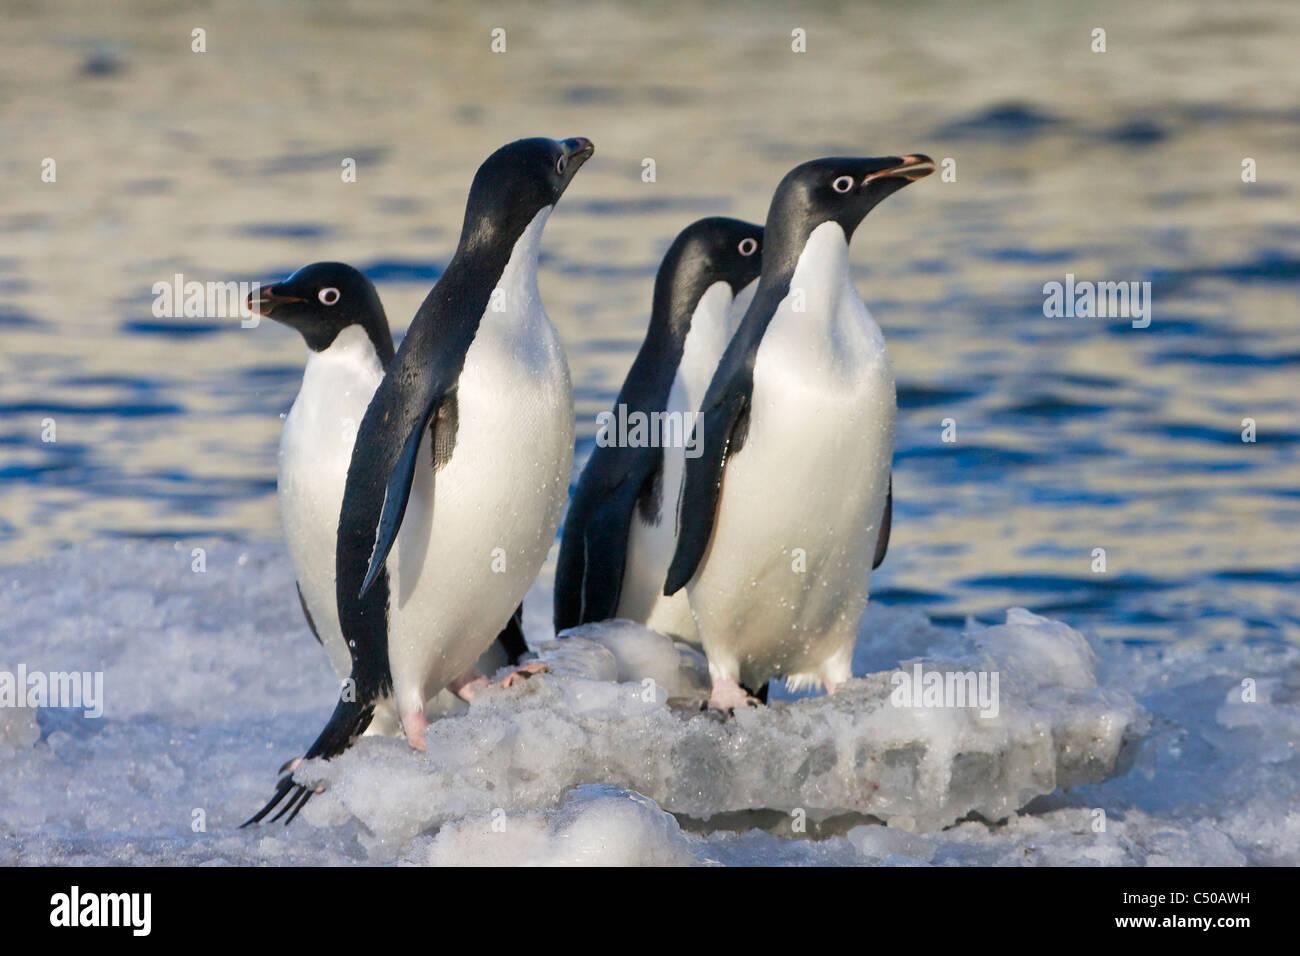 Adelie Penguin on South Shetland Island, Antarctica - Stock Image